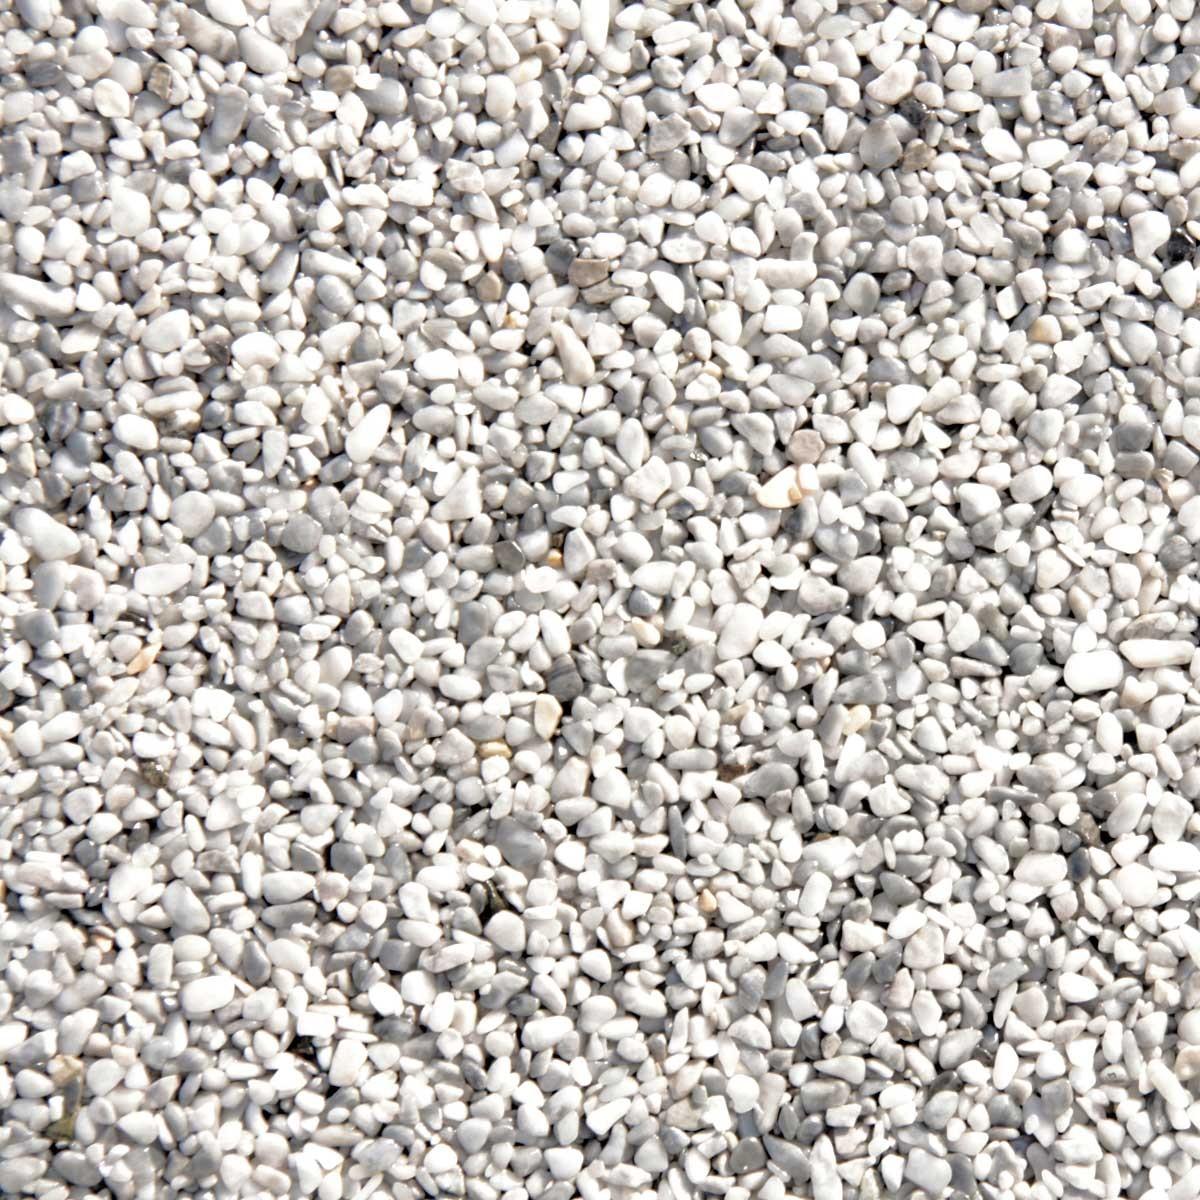 terralith marmor steinteppich nebula fein f r 2 5 qm steinteppich au en k rnung fein 2 4 mm. Black Bedroom Furniture Sets. Home Design Ideas